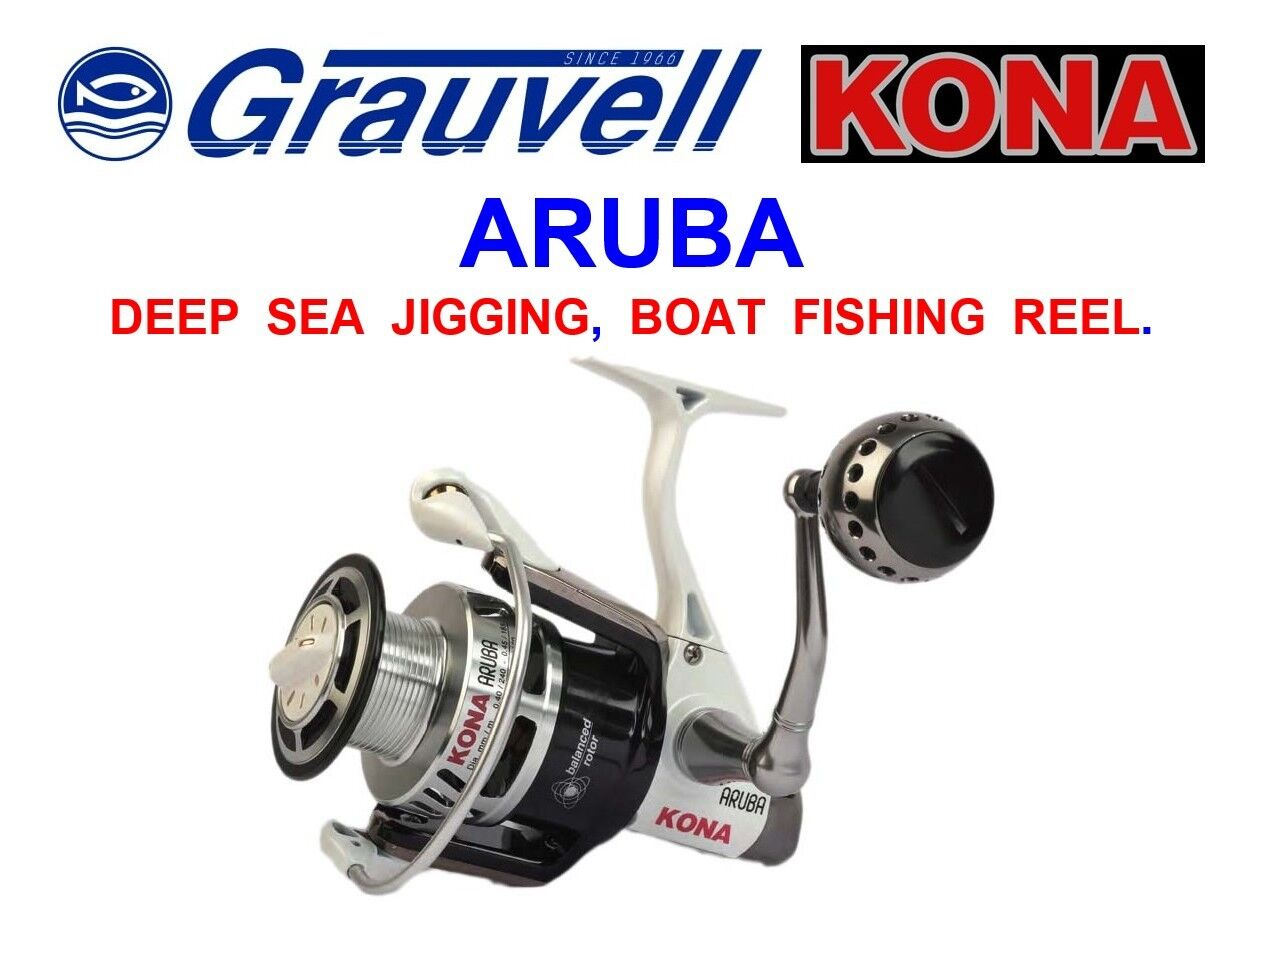 greyVELL KONA ARUBA FIXED SPOOL BOAT REEL FOR DEEP SEA FISHING SLOW ROD JIGGING